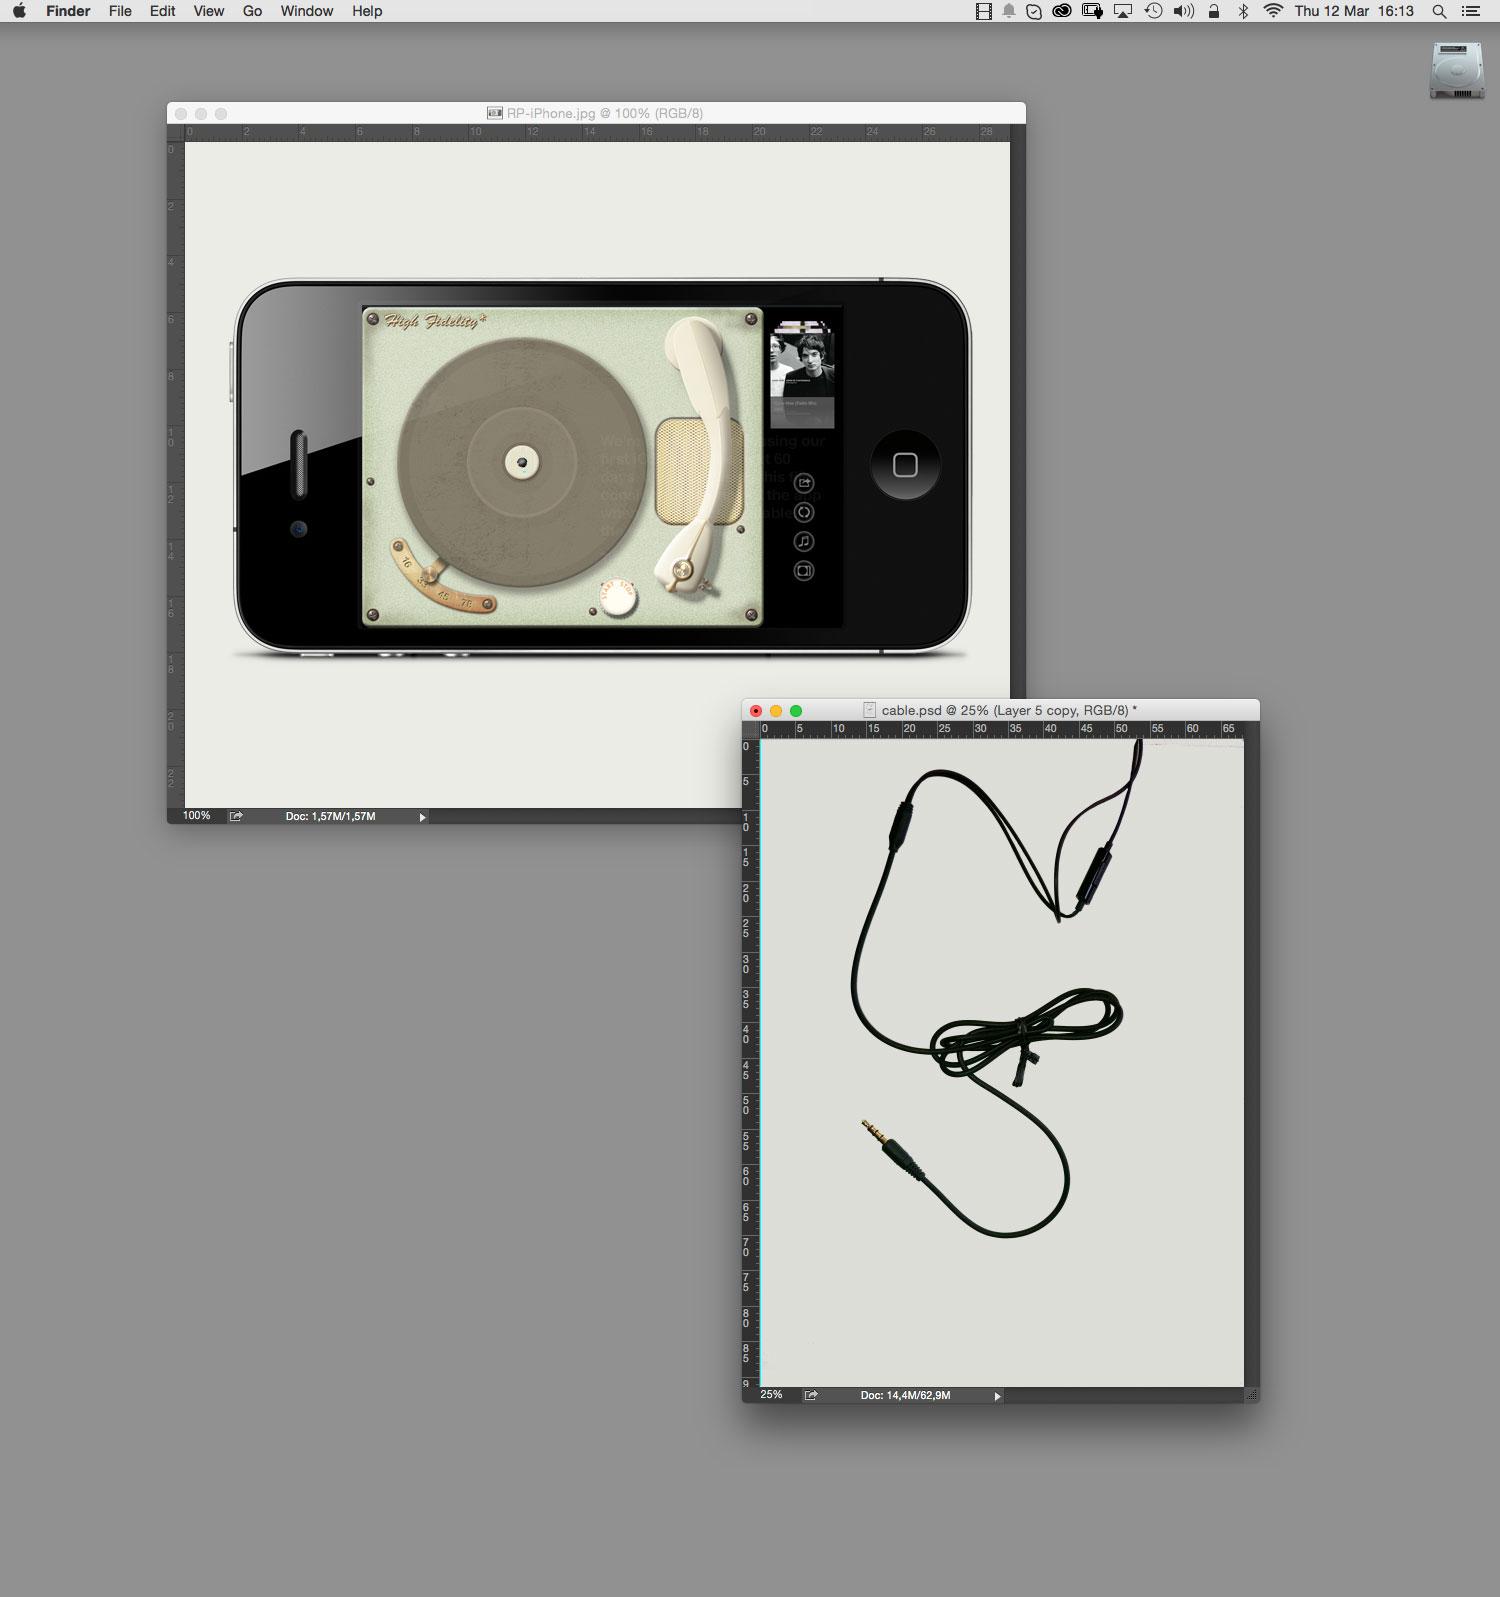 Monique_Broring_Vinyl_App.jpg